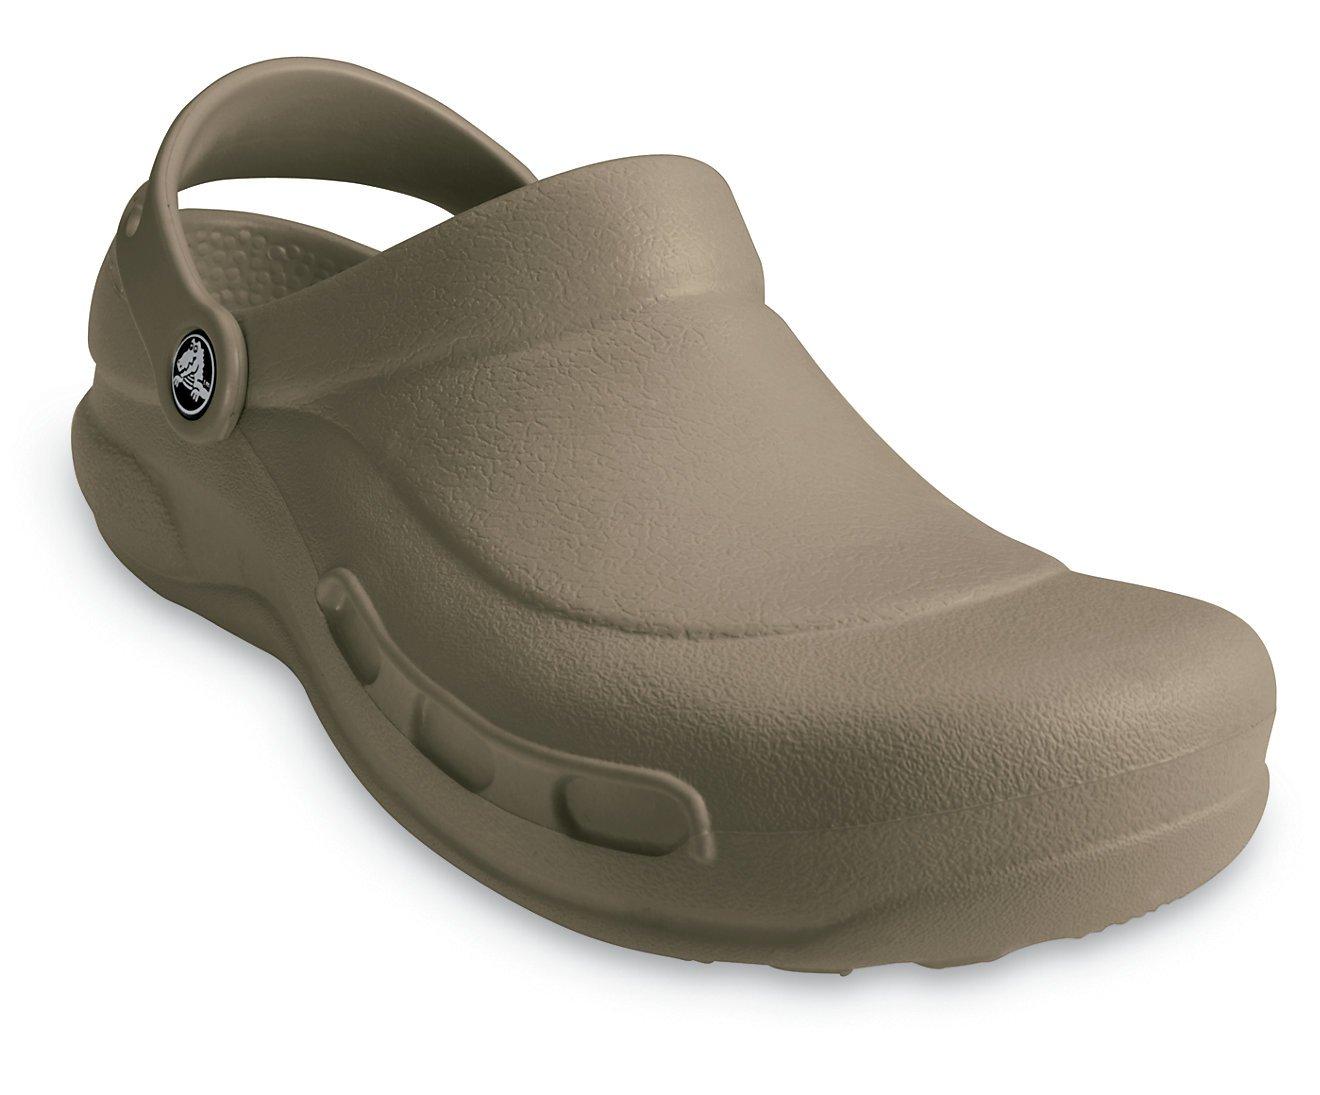 2c15f0e1baa982 Get Quotations · Crocs Specialist Unisex Footwear